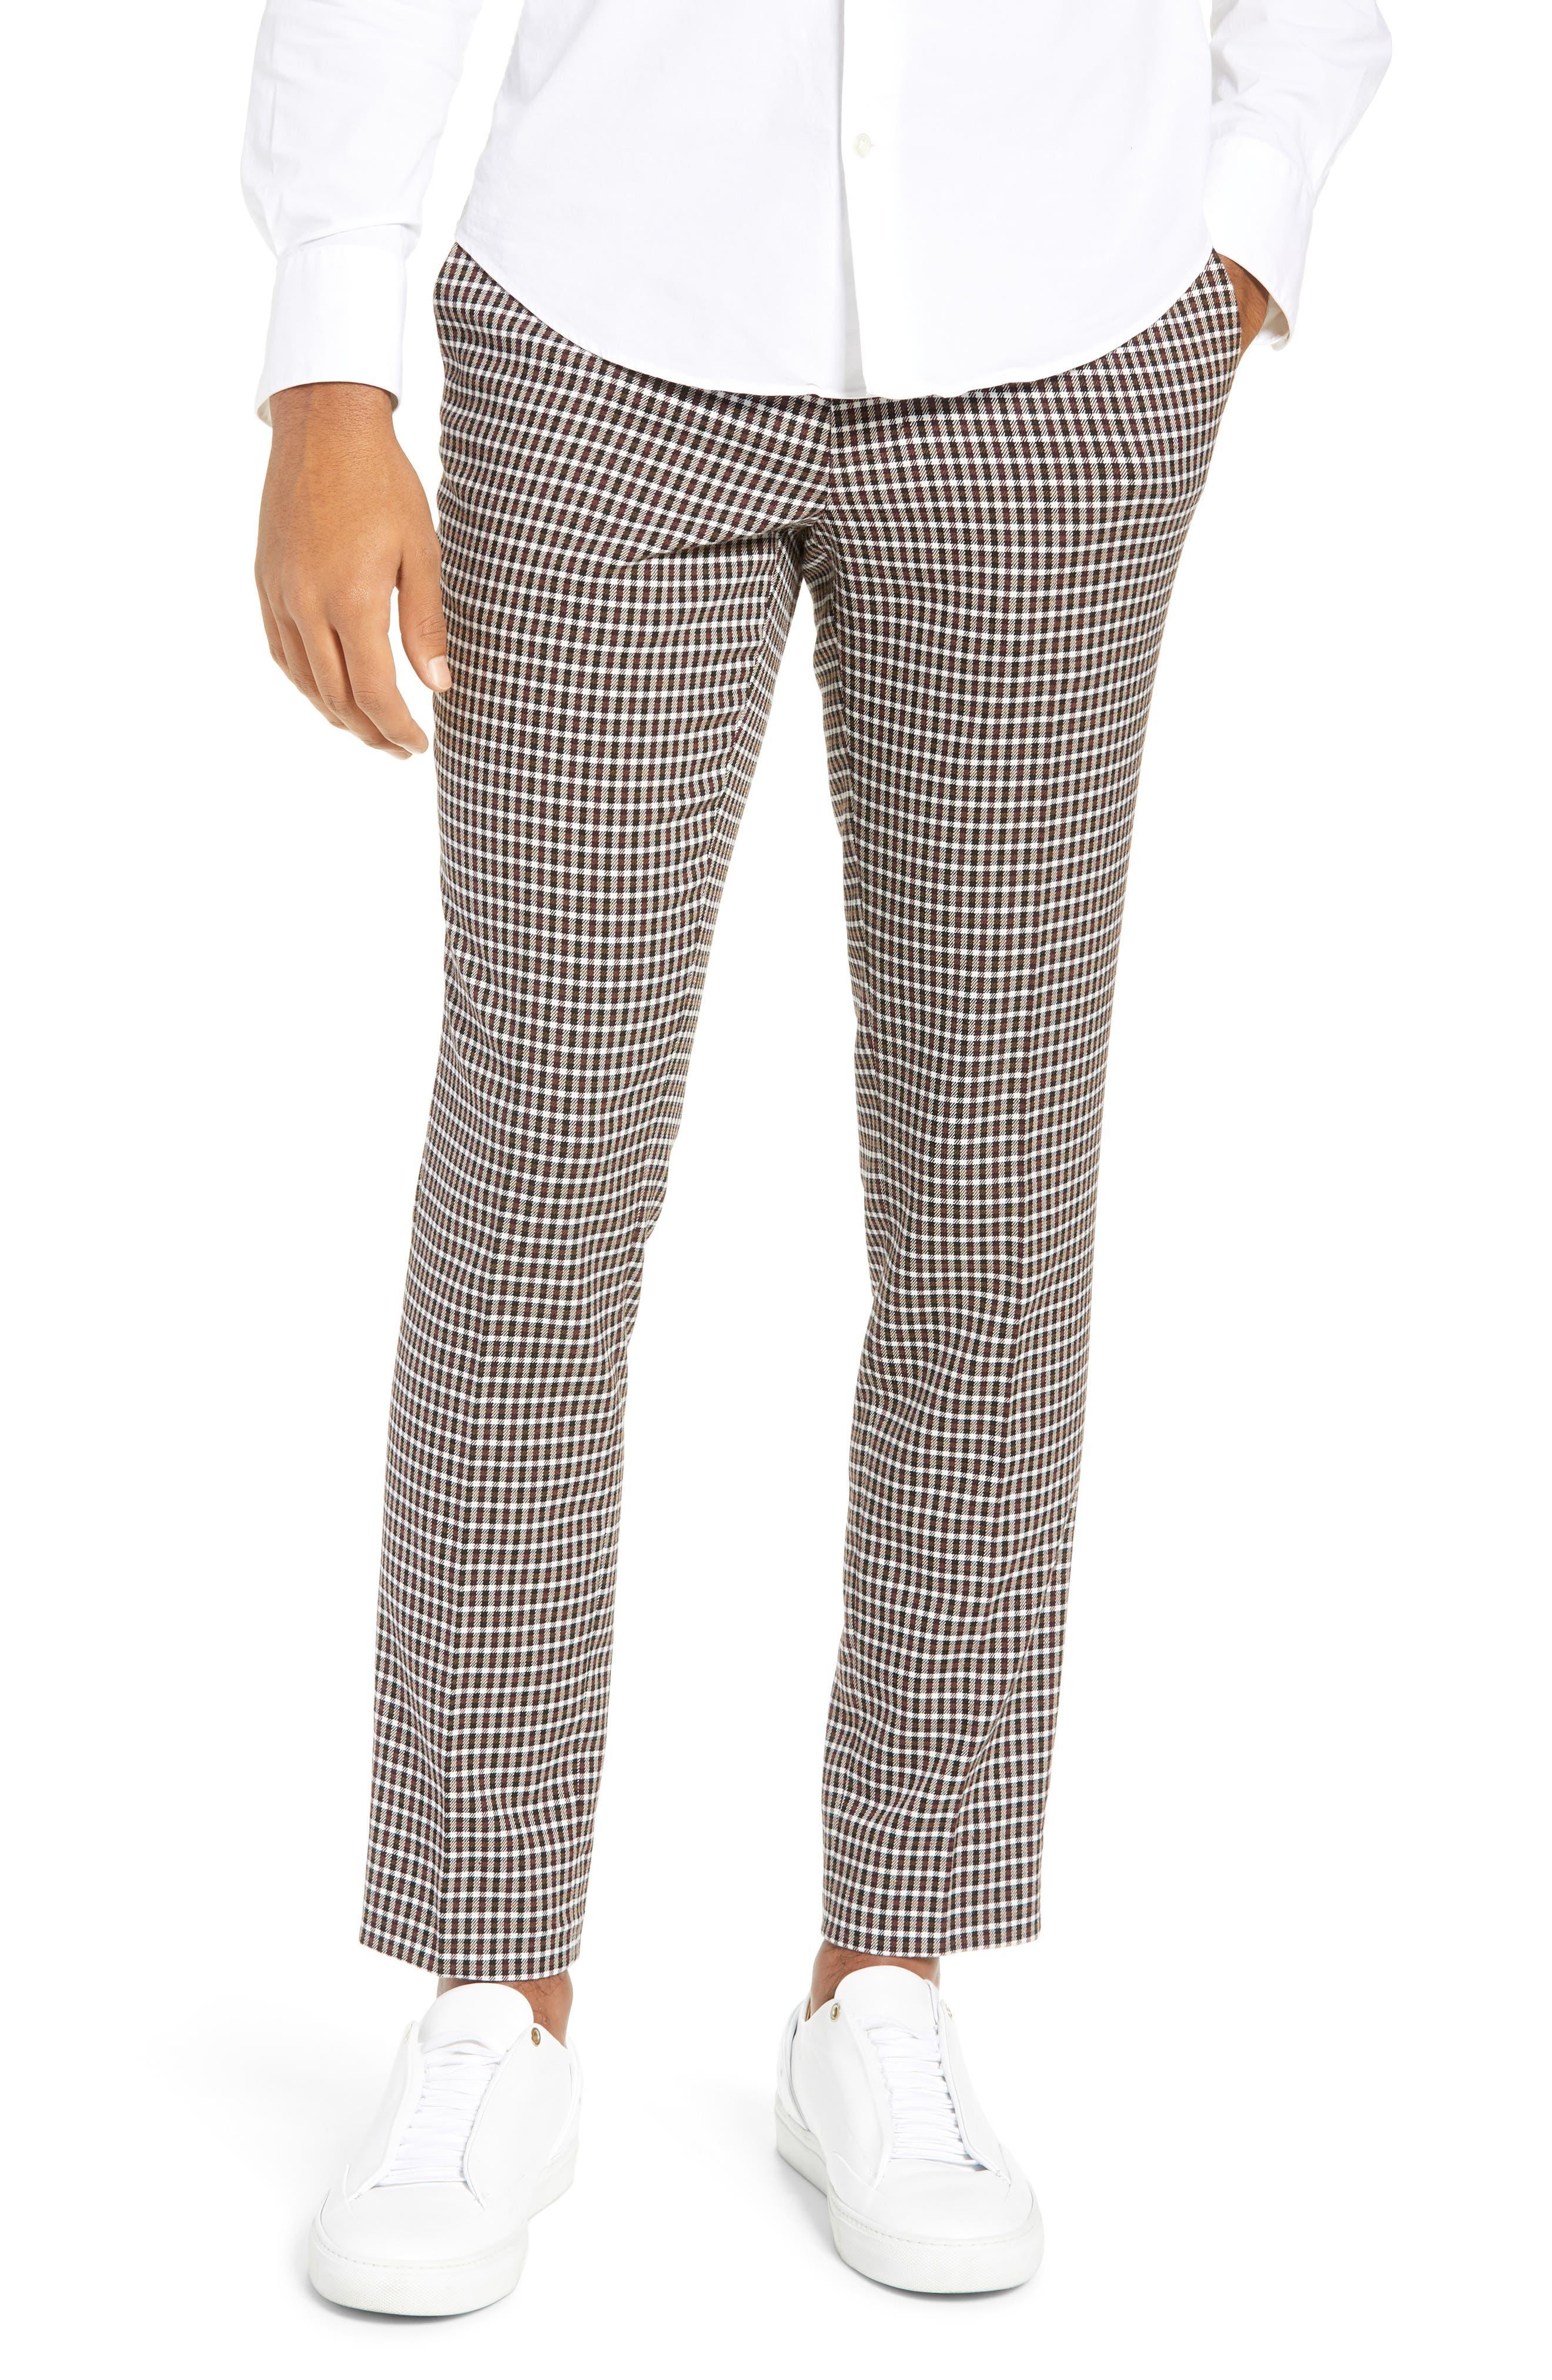 TOPMAN, Multicheck Skinny Fit Trousers, Main thumbnail 1, color, BLACK MULTI